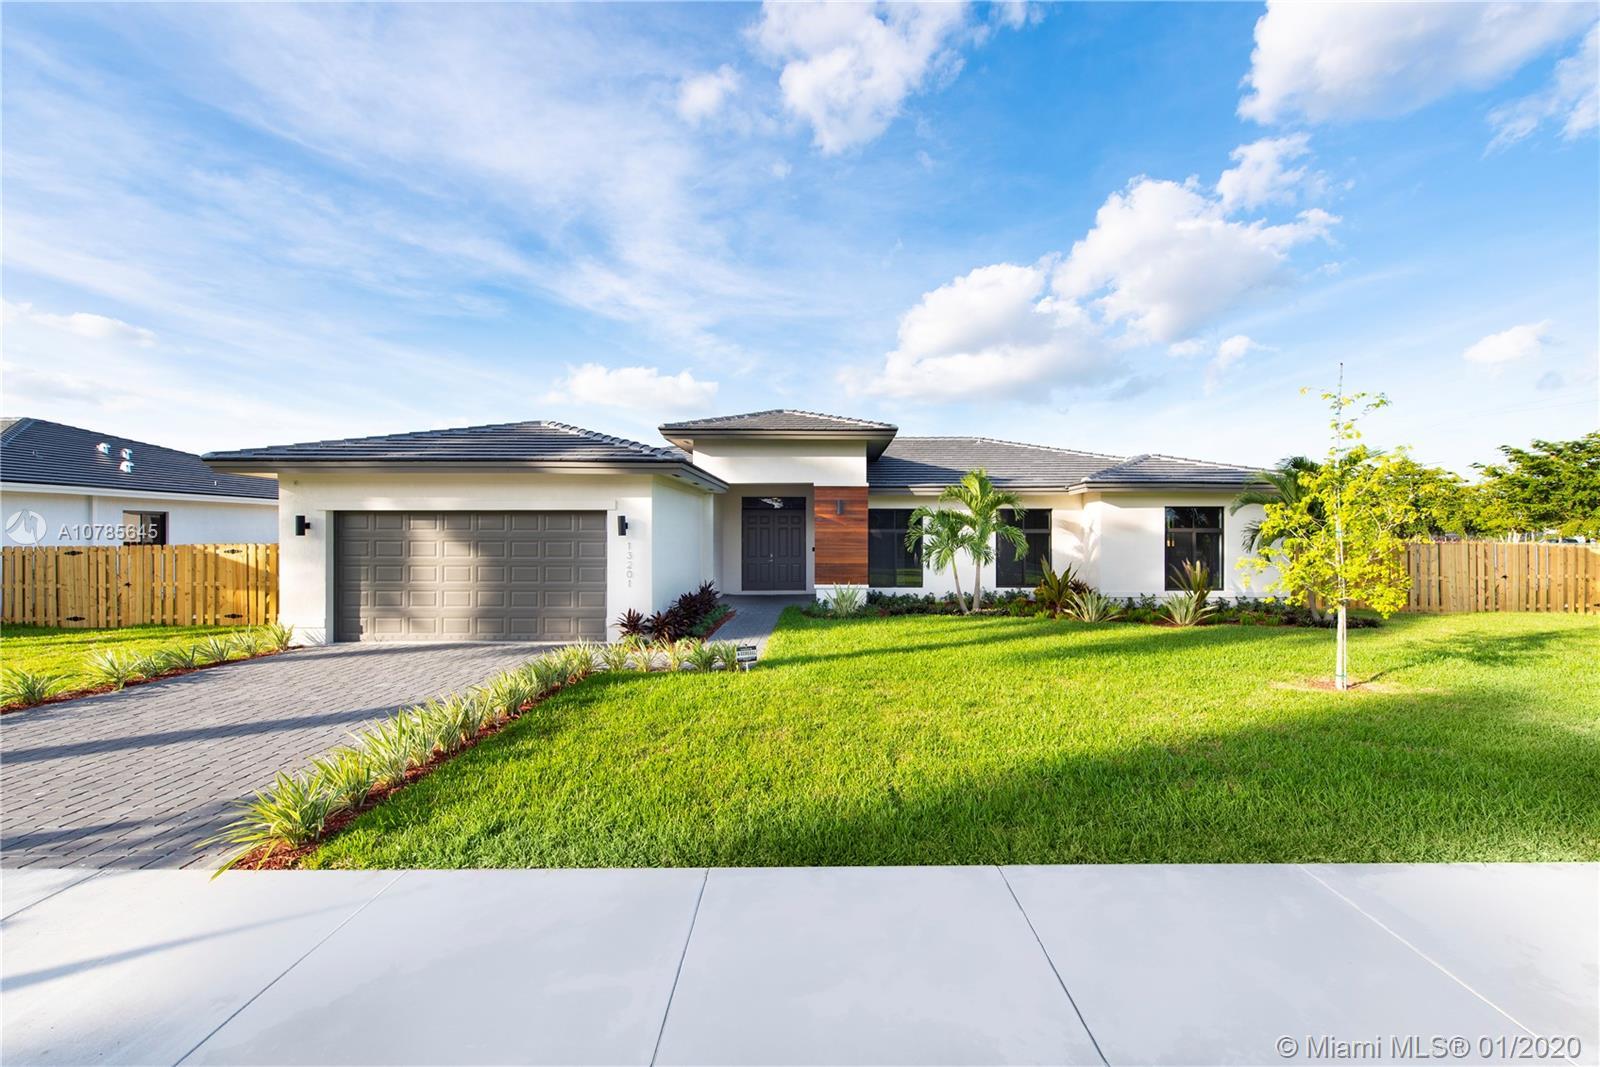 13253 SW 229 St, Homestead, FL 33170 - Homestead, FL real estate listing